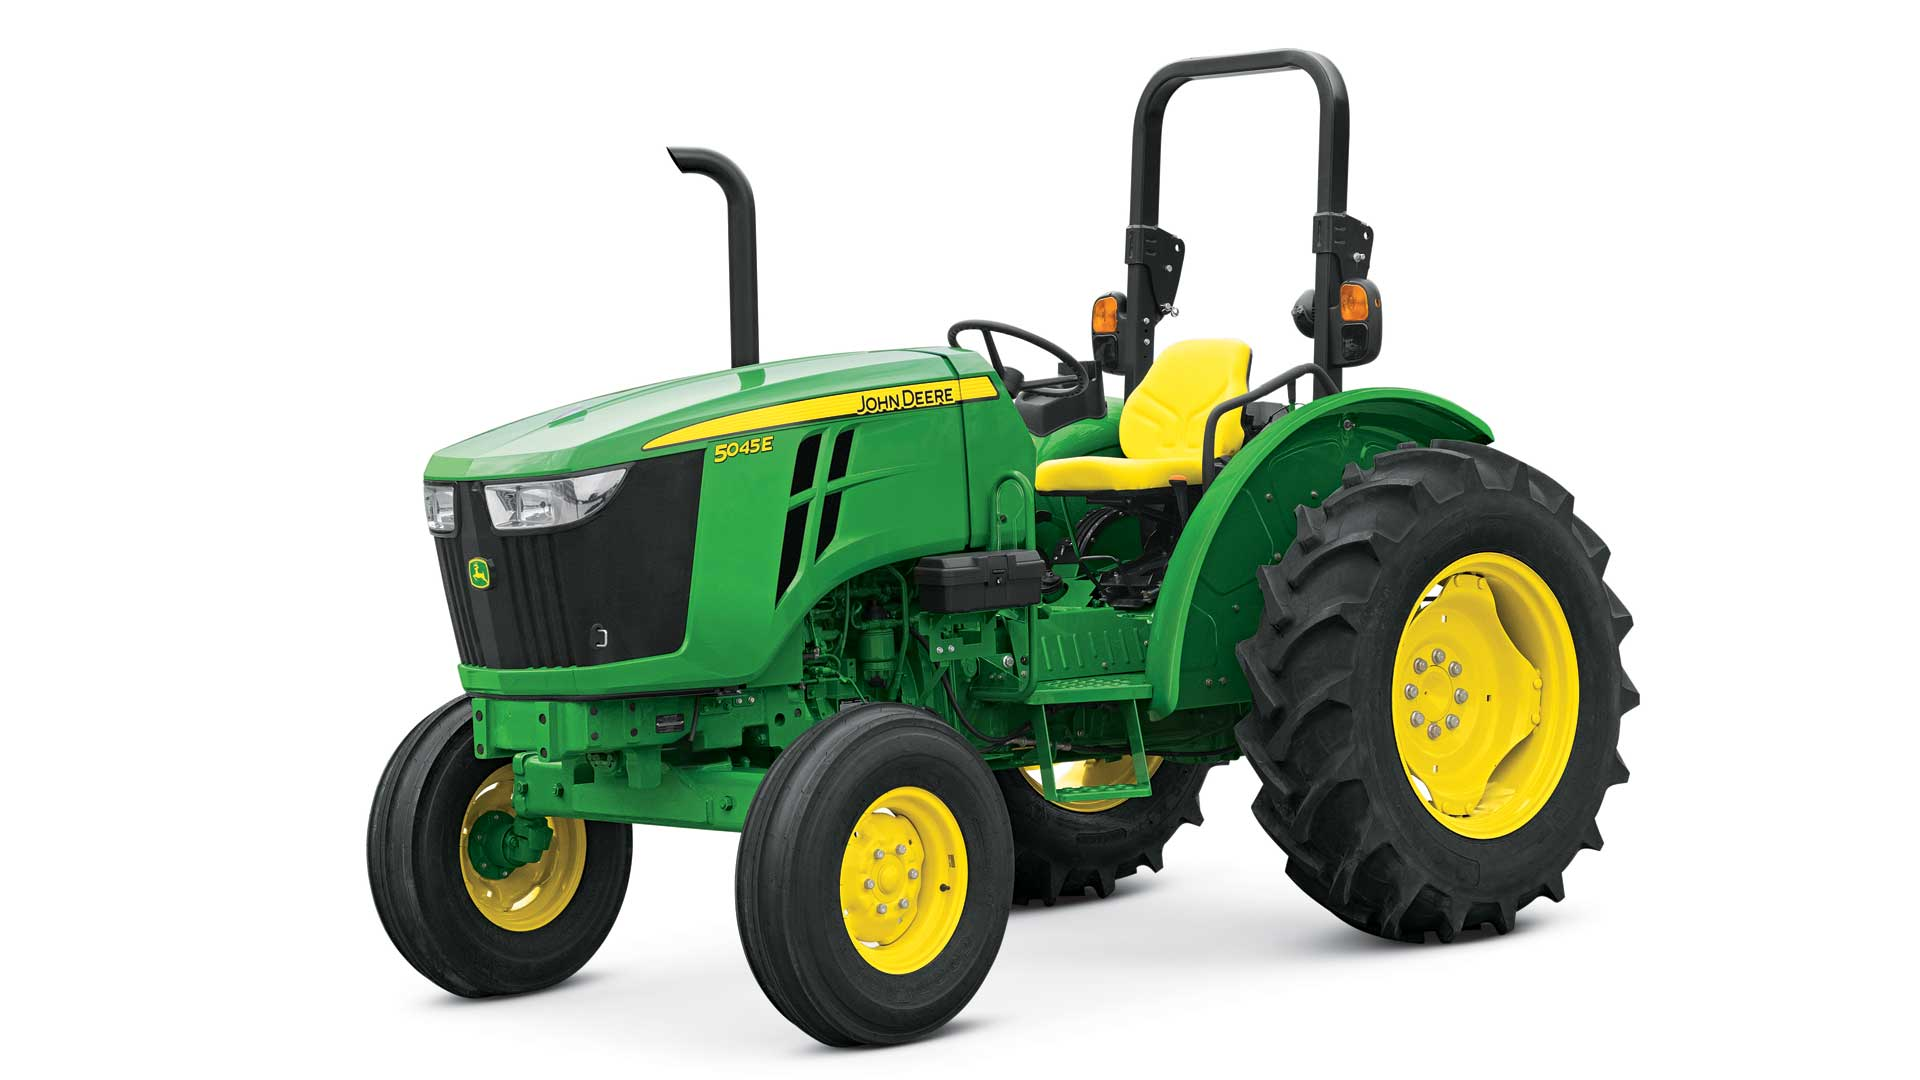 Compact & Utility Tractors | E Series | John Deere US